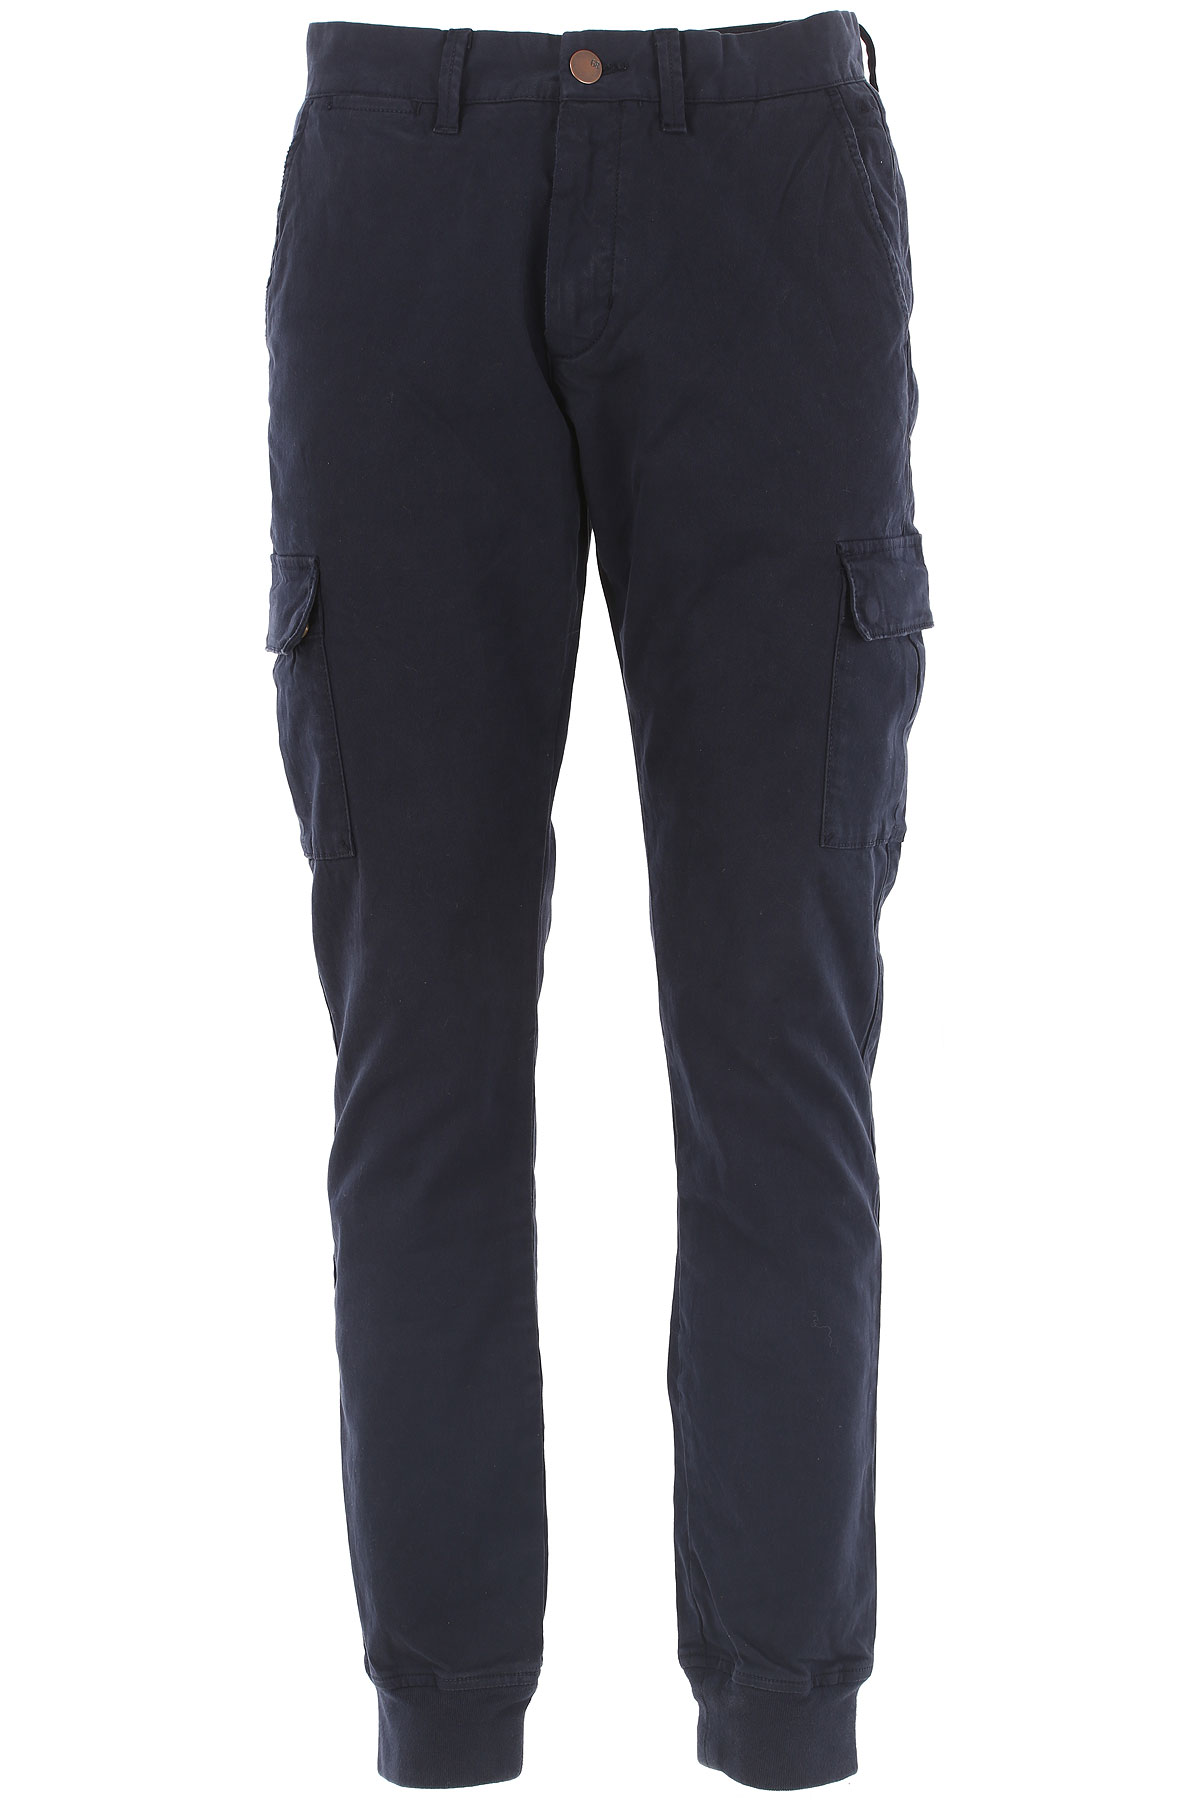 Sun68 Pantalon Homme, Military Cuff, Bleu marine, Coton, 2017, 48 49